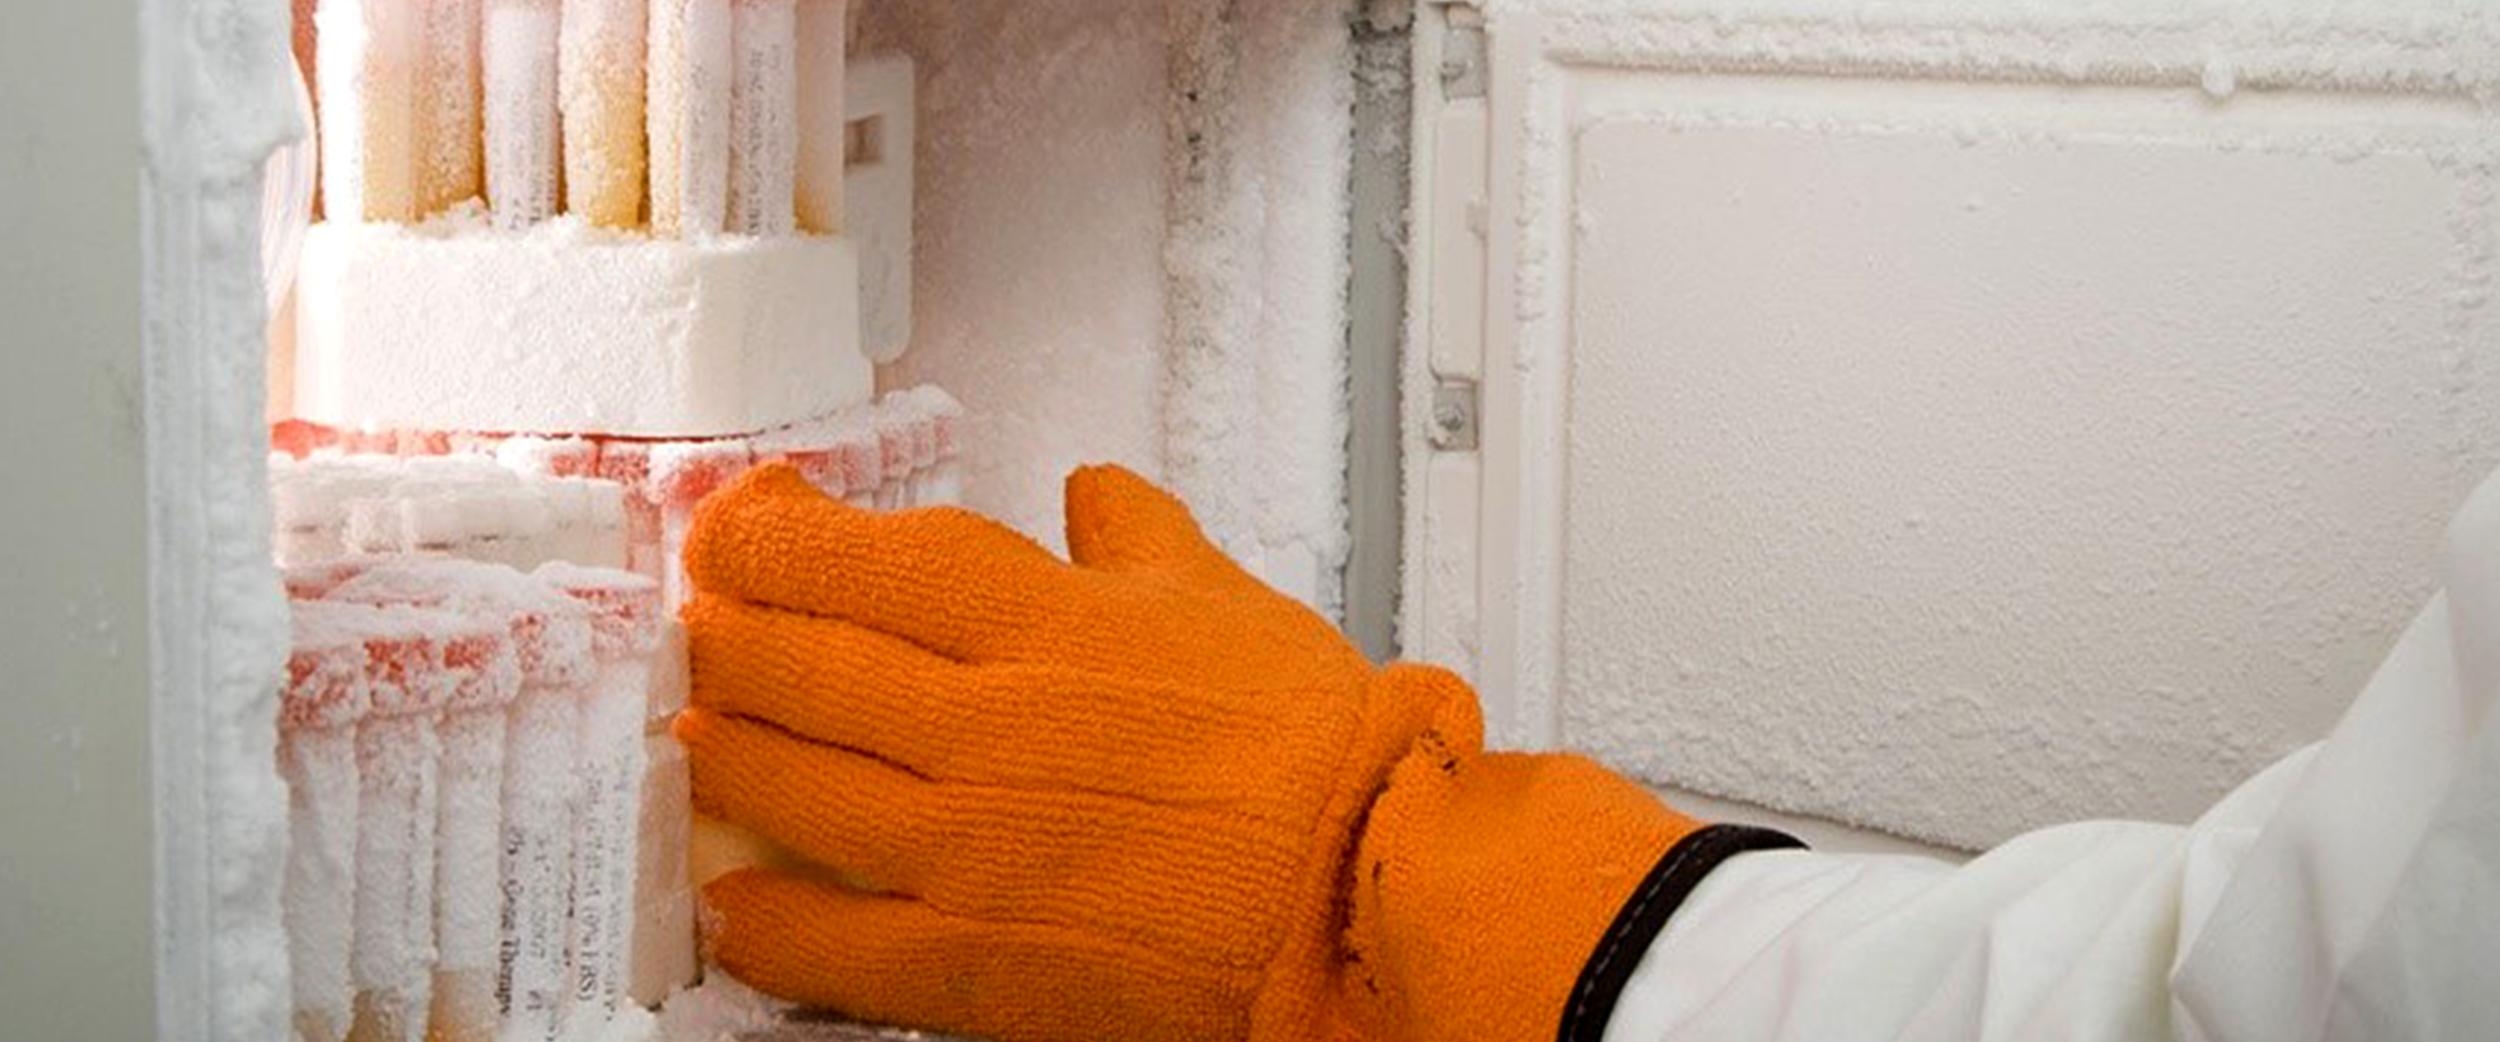 Freezer Inventory Management